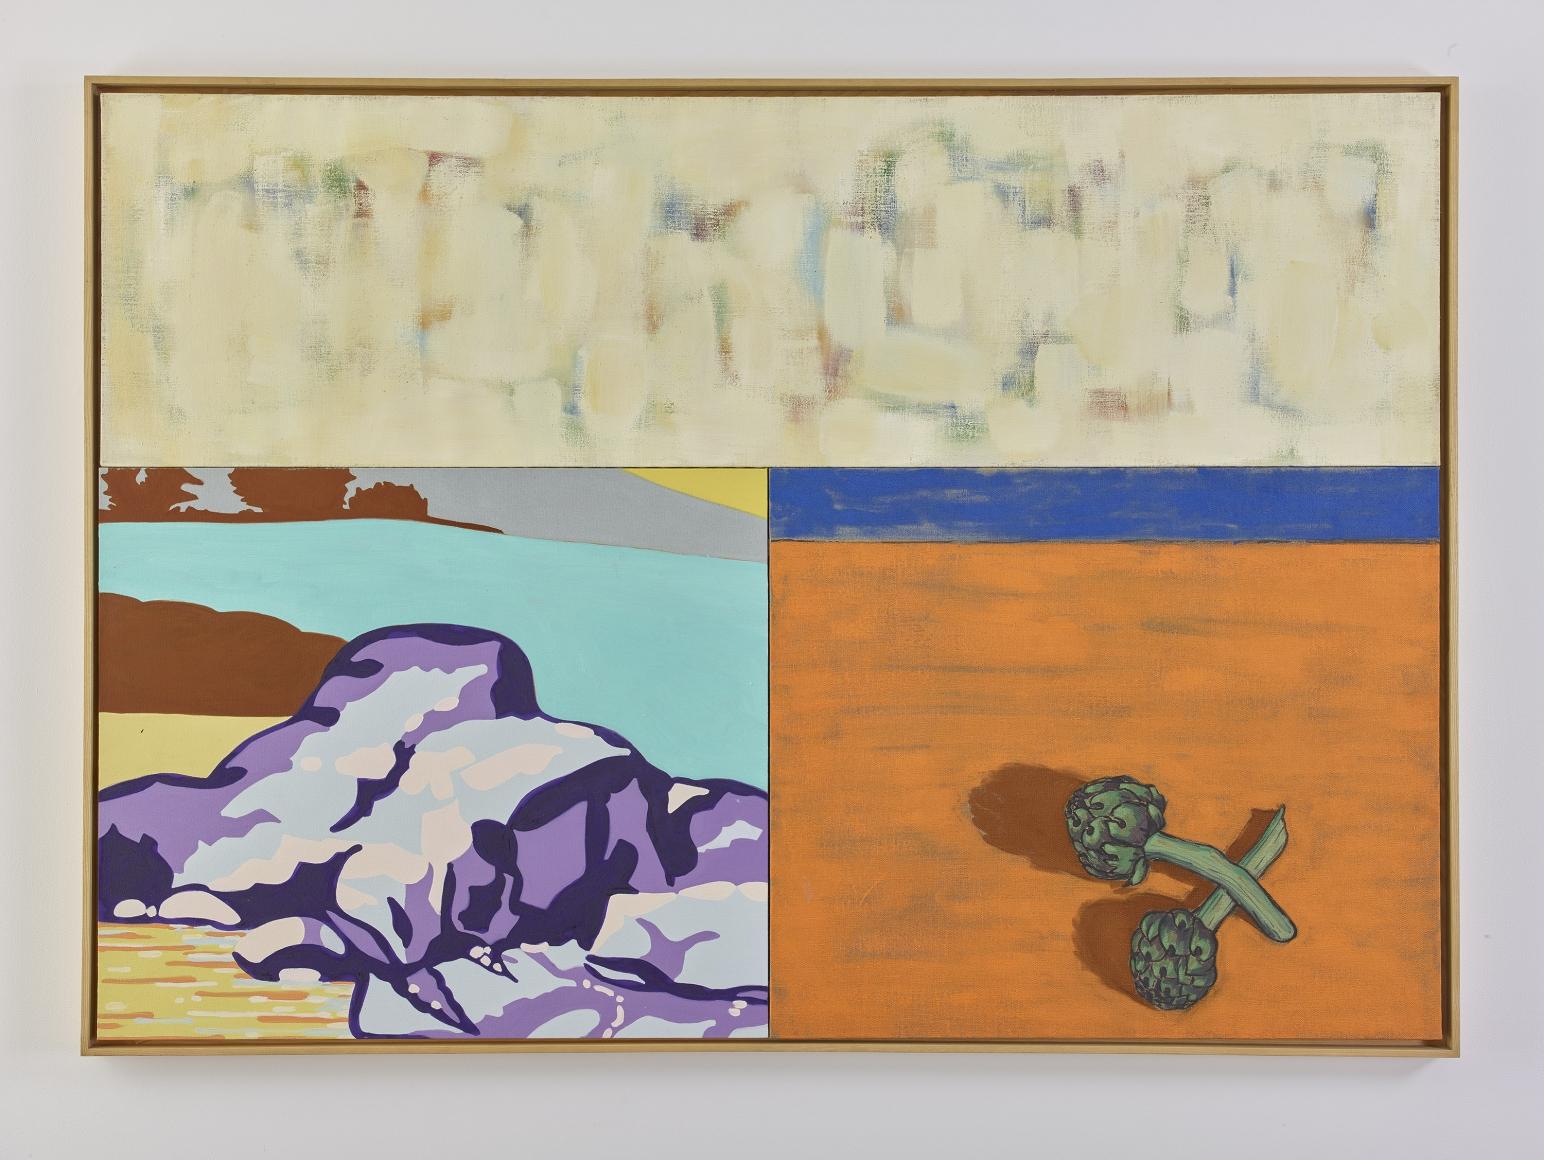 DAVID SALLE Endives, 2000